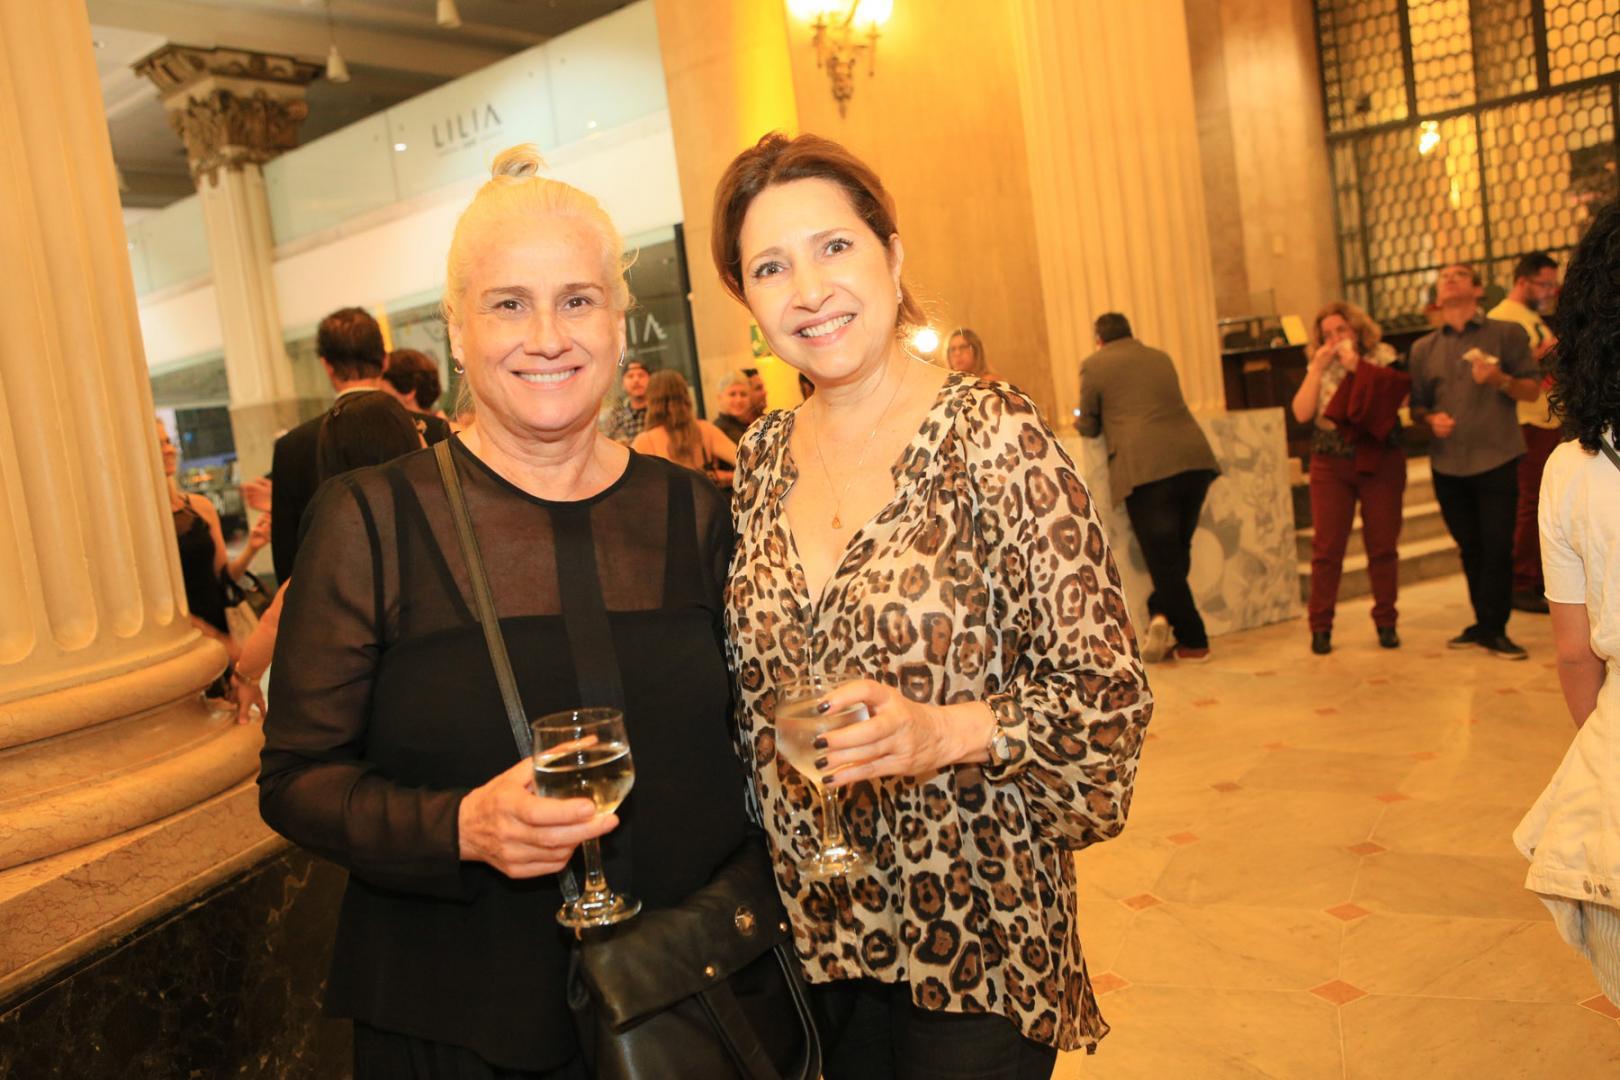 Vera Holtz e Malu Valle prestigiam expo do Estudio Dreamworks Animation